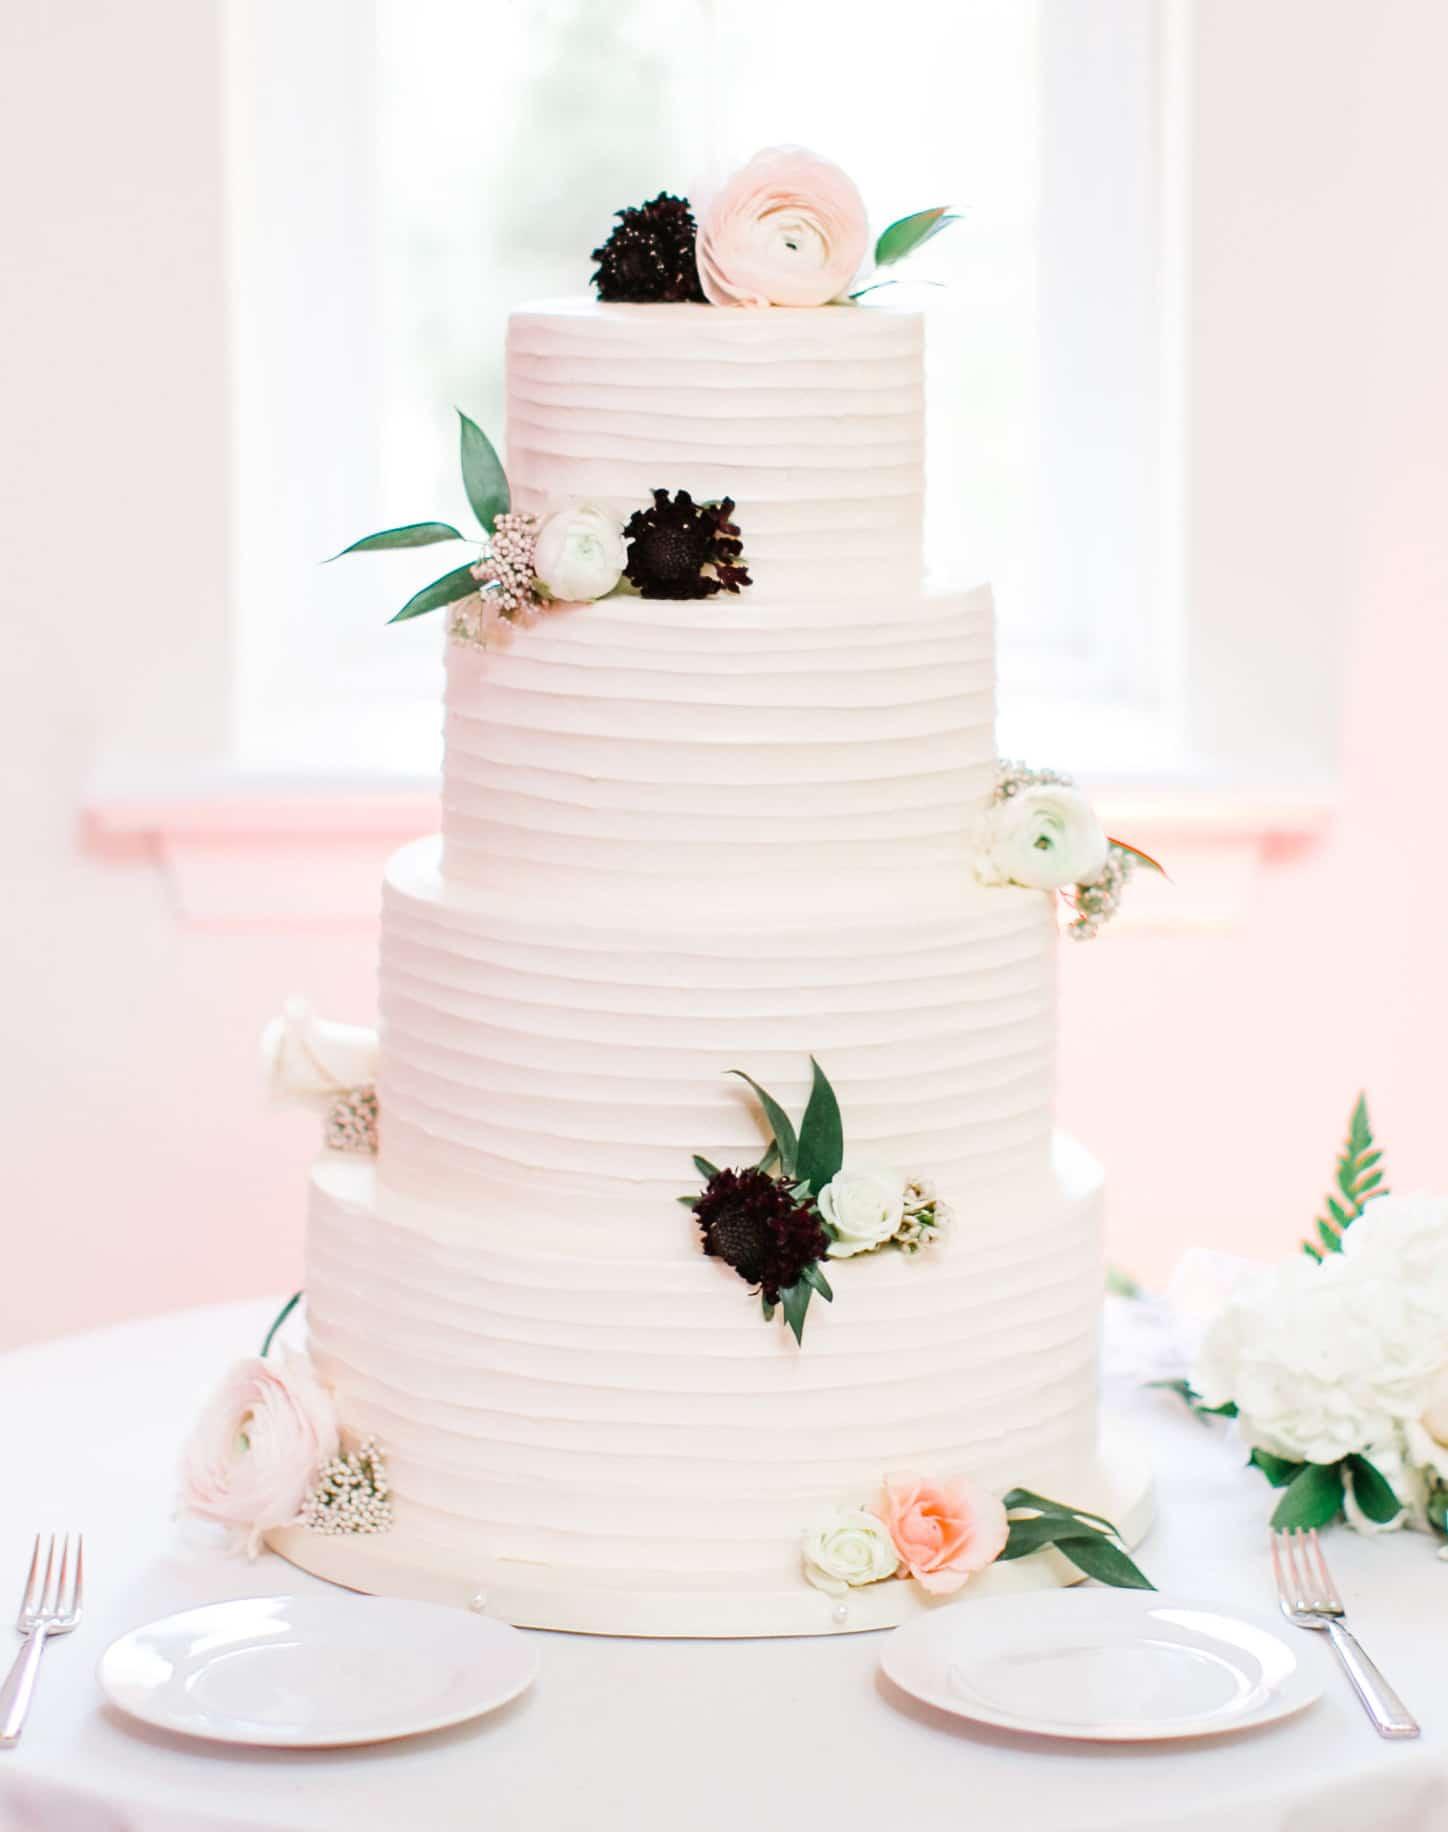 banded-buttercream-wedding-cake-whipped-bakeshop-main